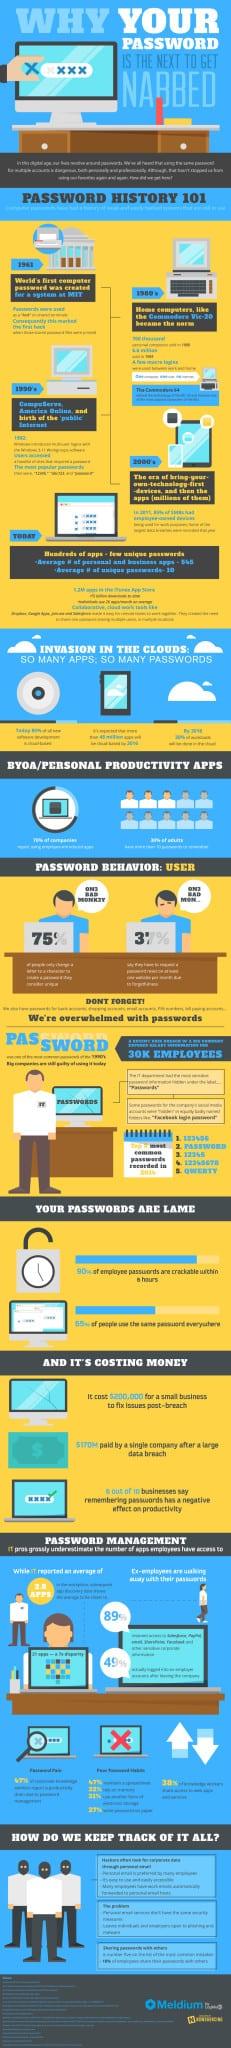 Meldium_password_infographic